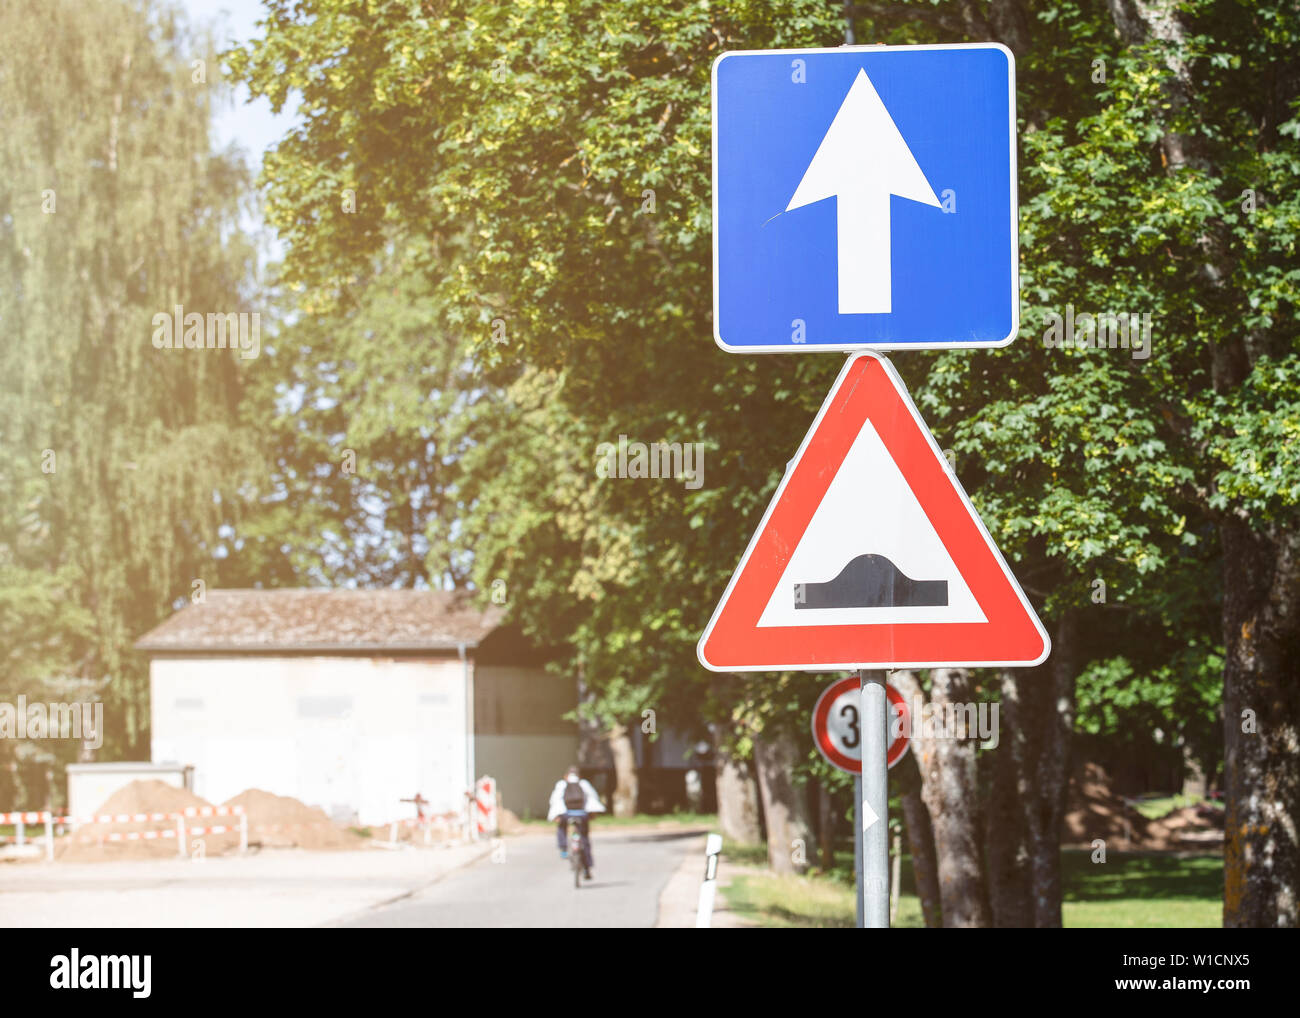 Bumpy road traffic sign - Stock Image